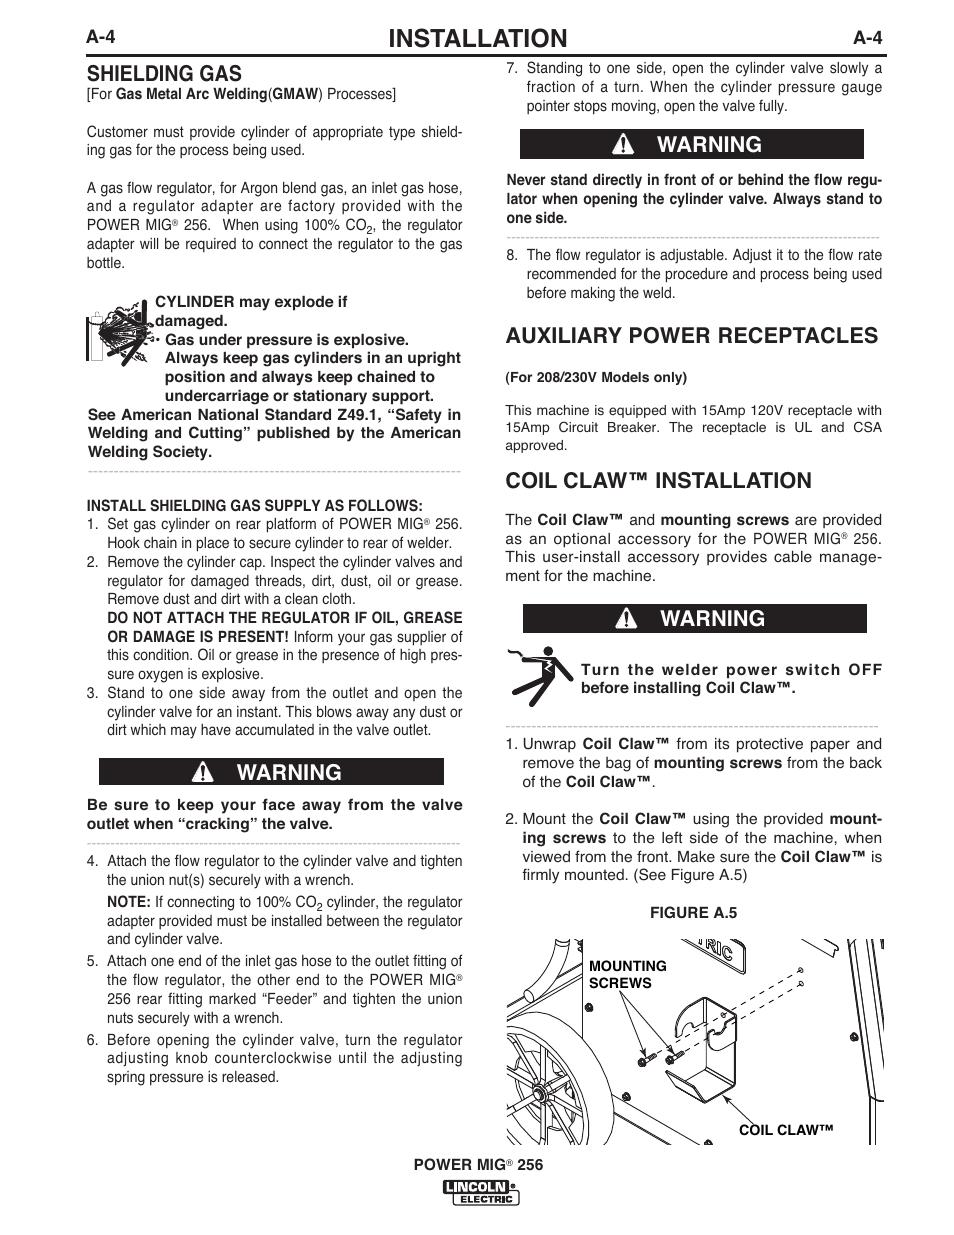 Installation, Shielding gas, Warning | Lincoln Electric IM10096 ...